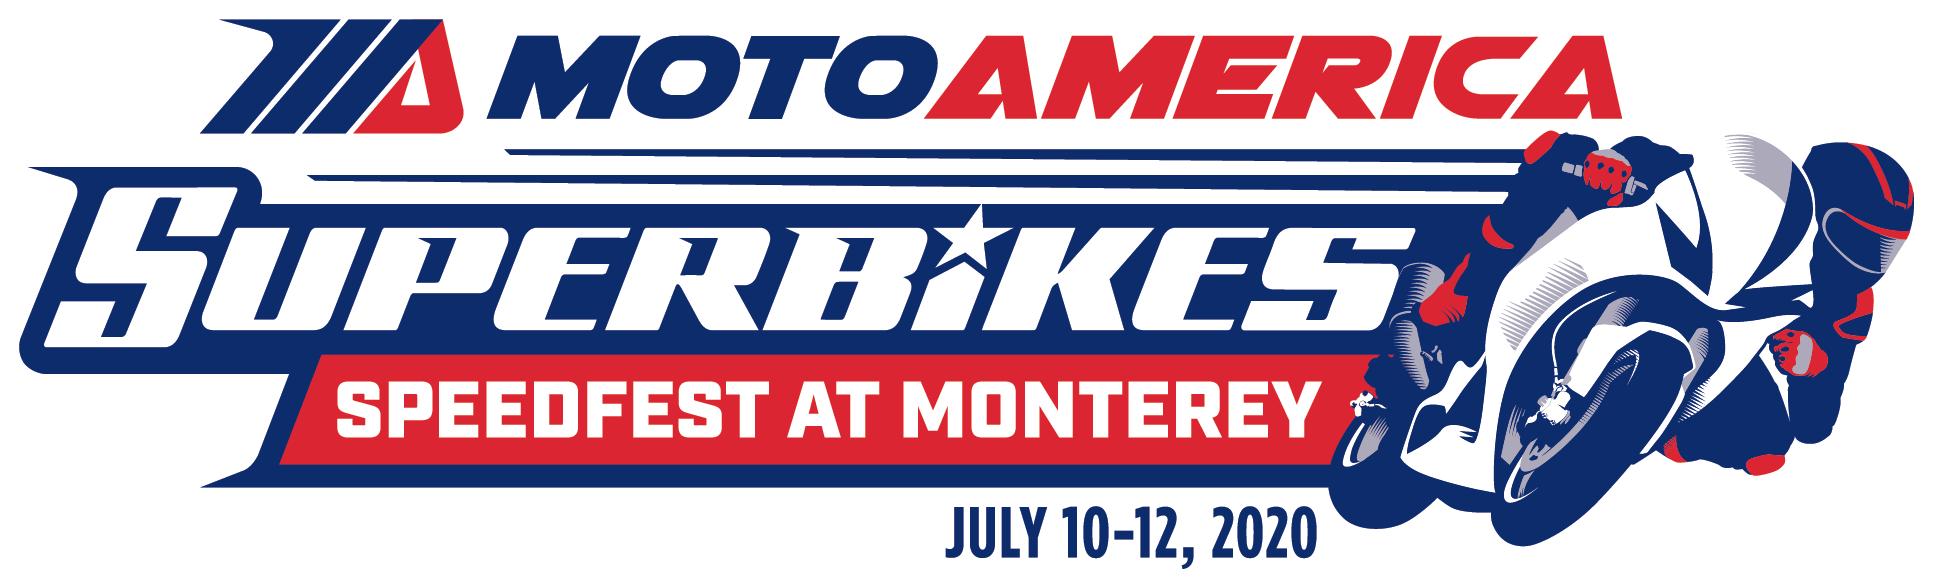 MotoAmerica Superbike Speedfest at Monterey - July 10-12, 2020